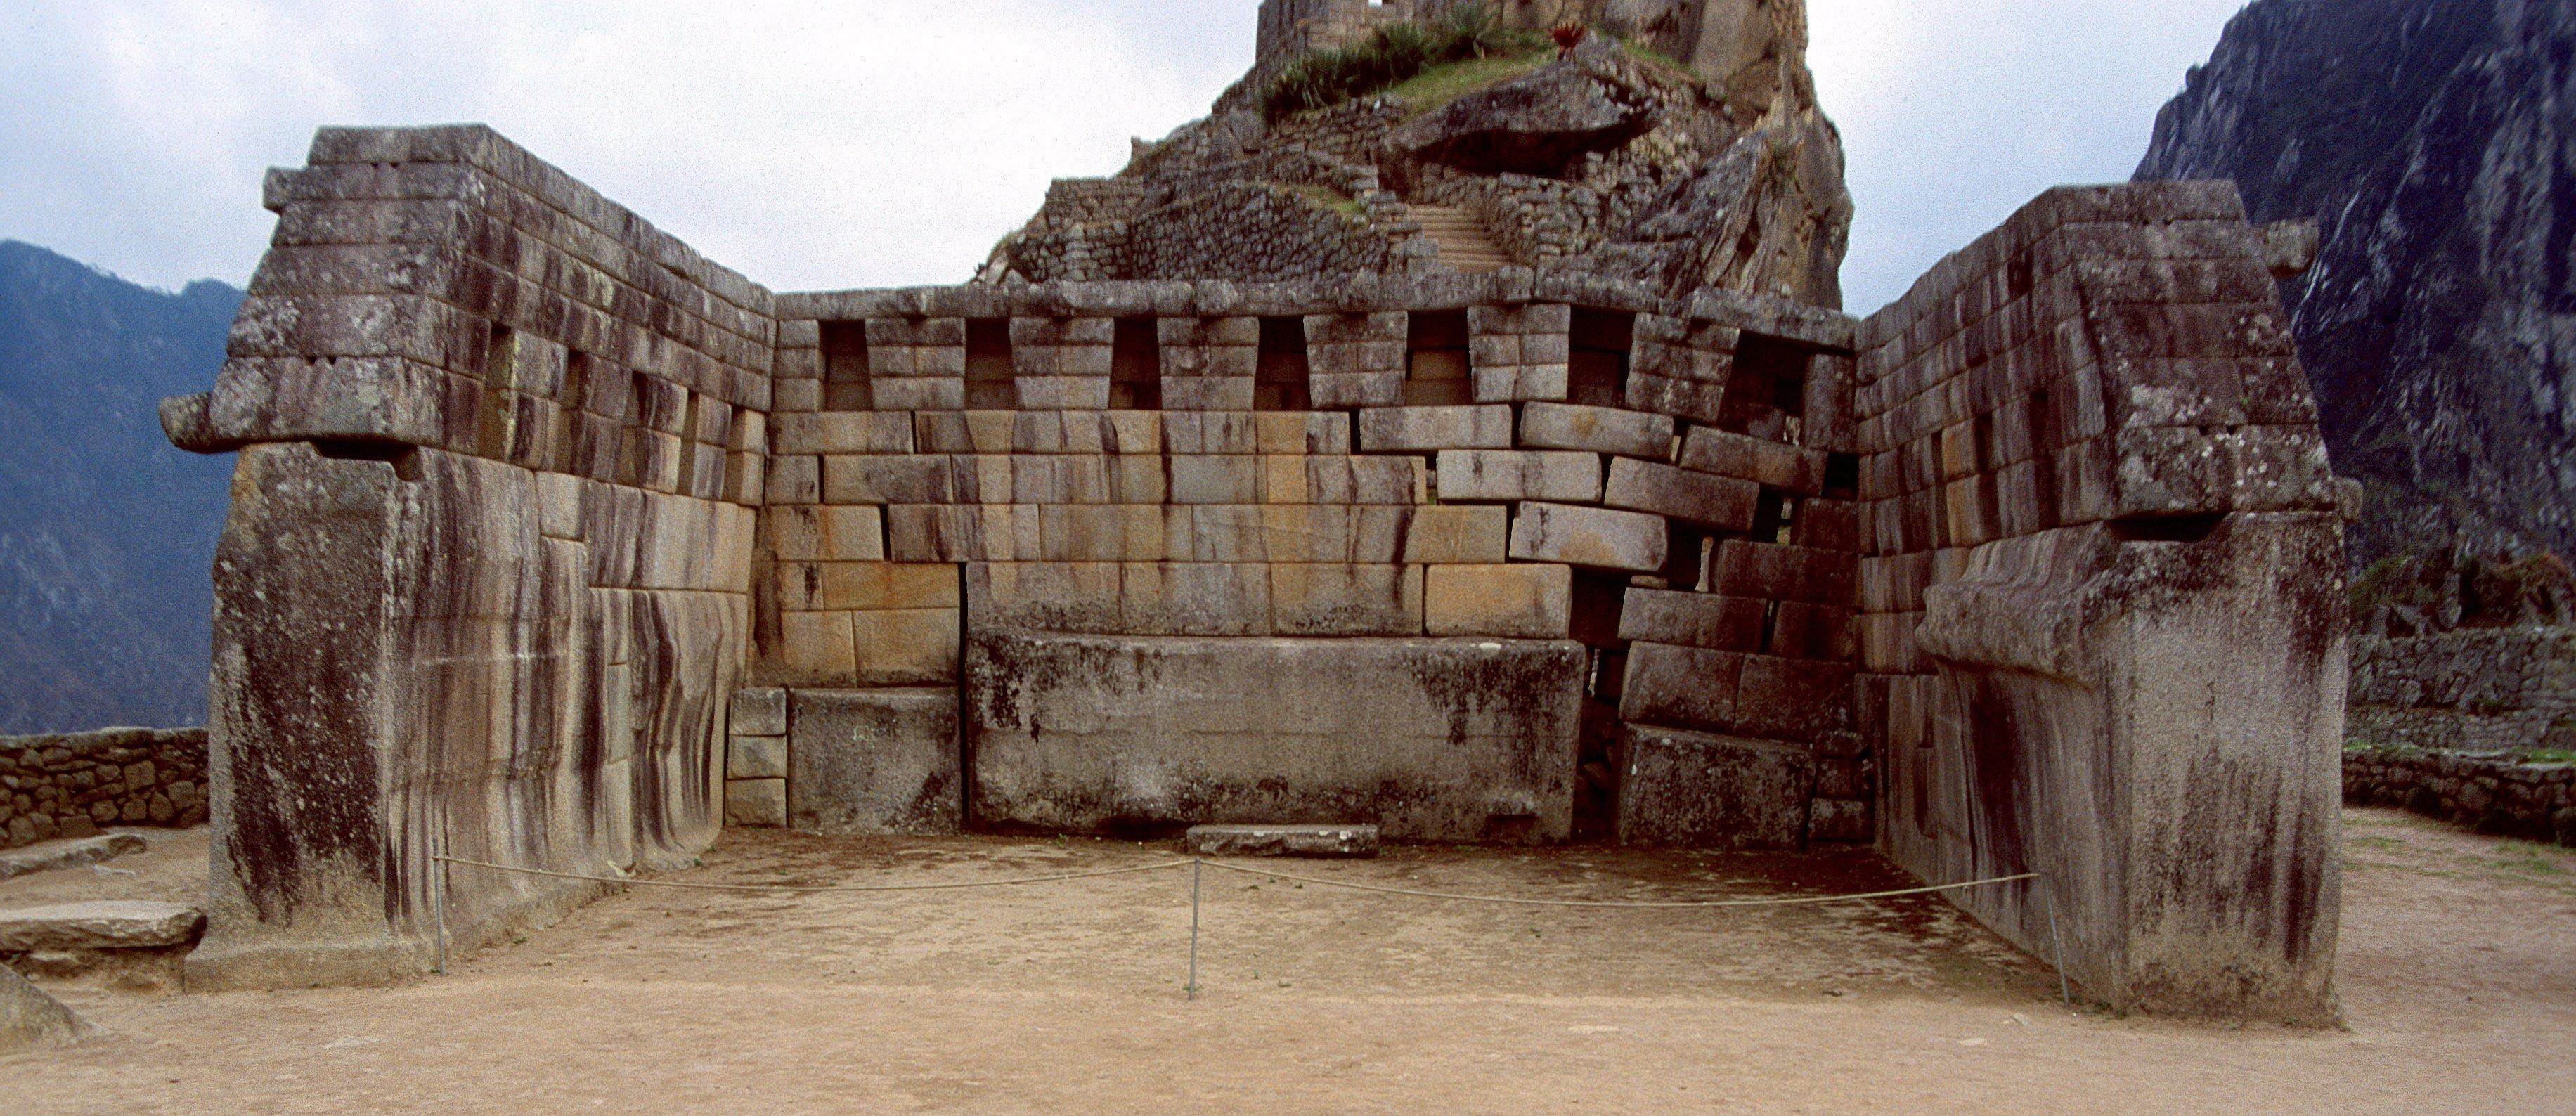 Plaza Sagrada - Machu Picchu